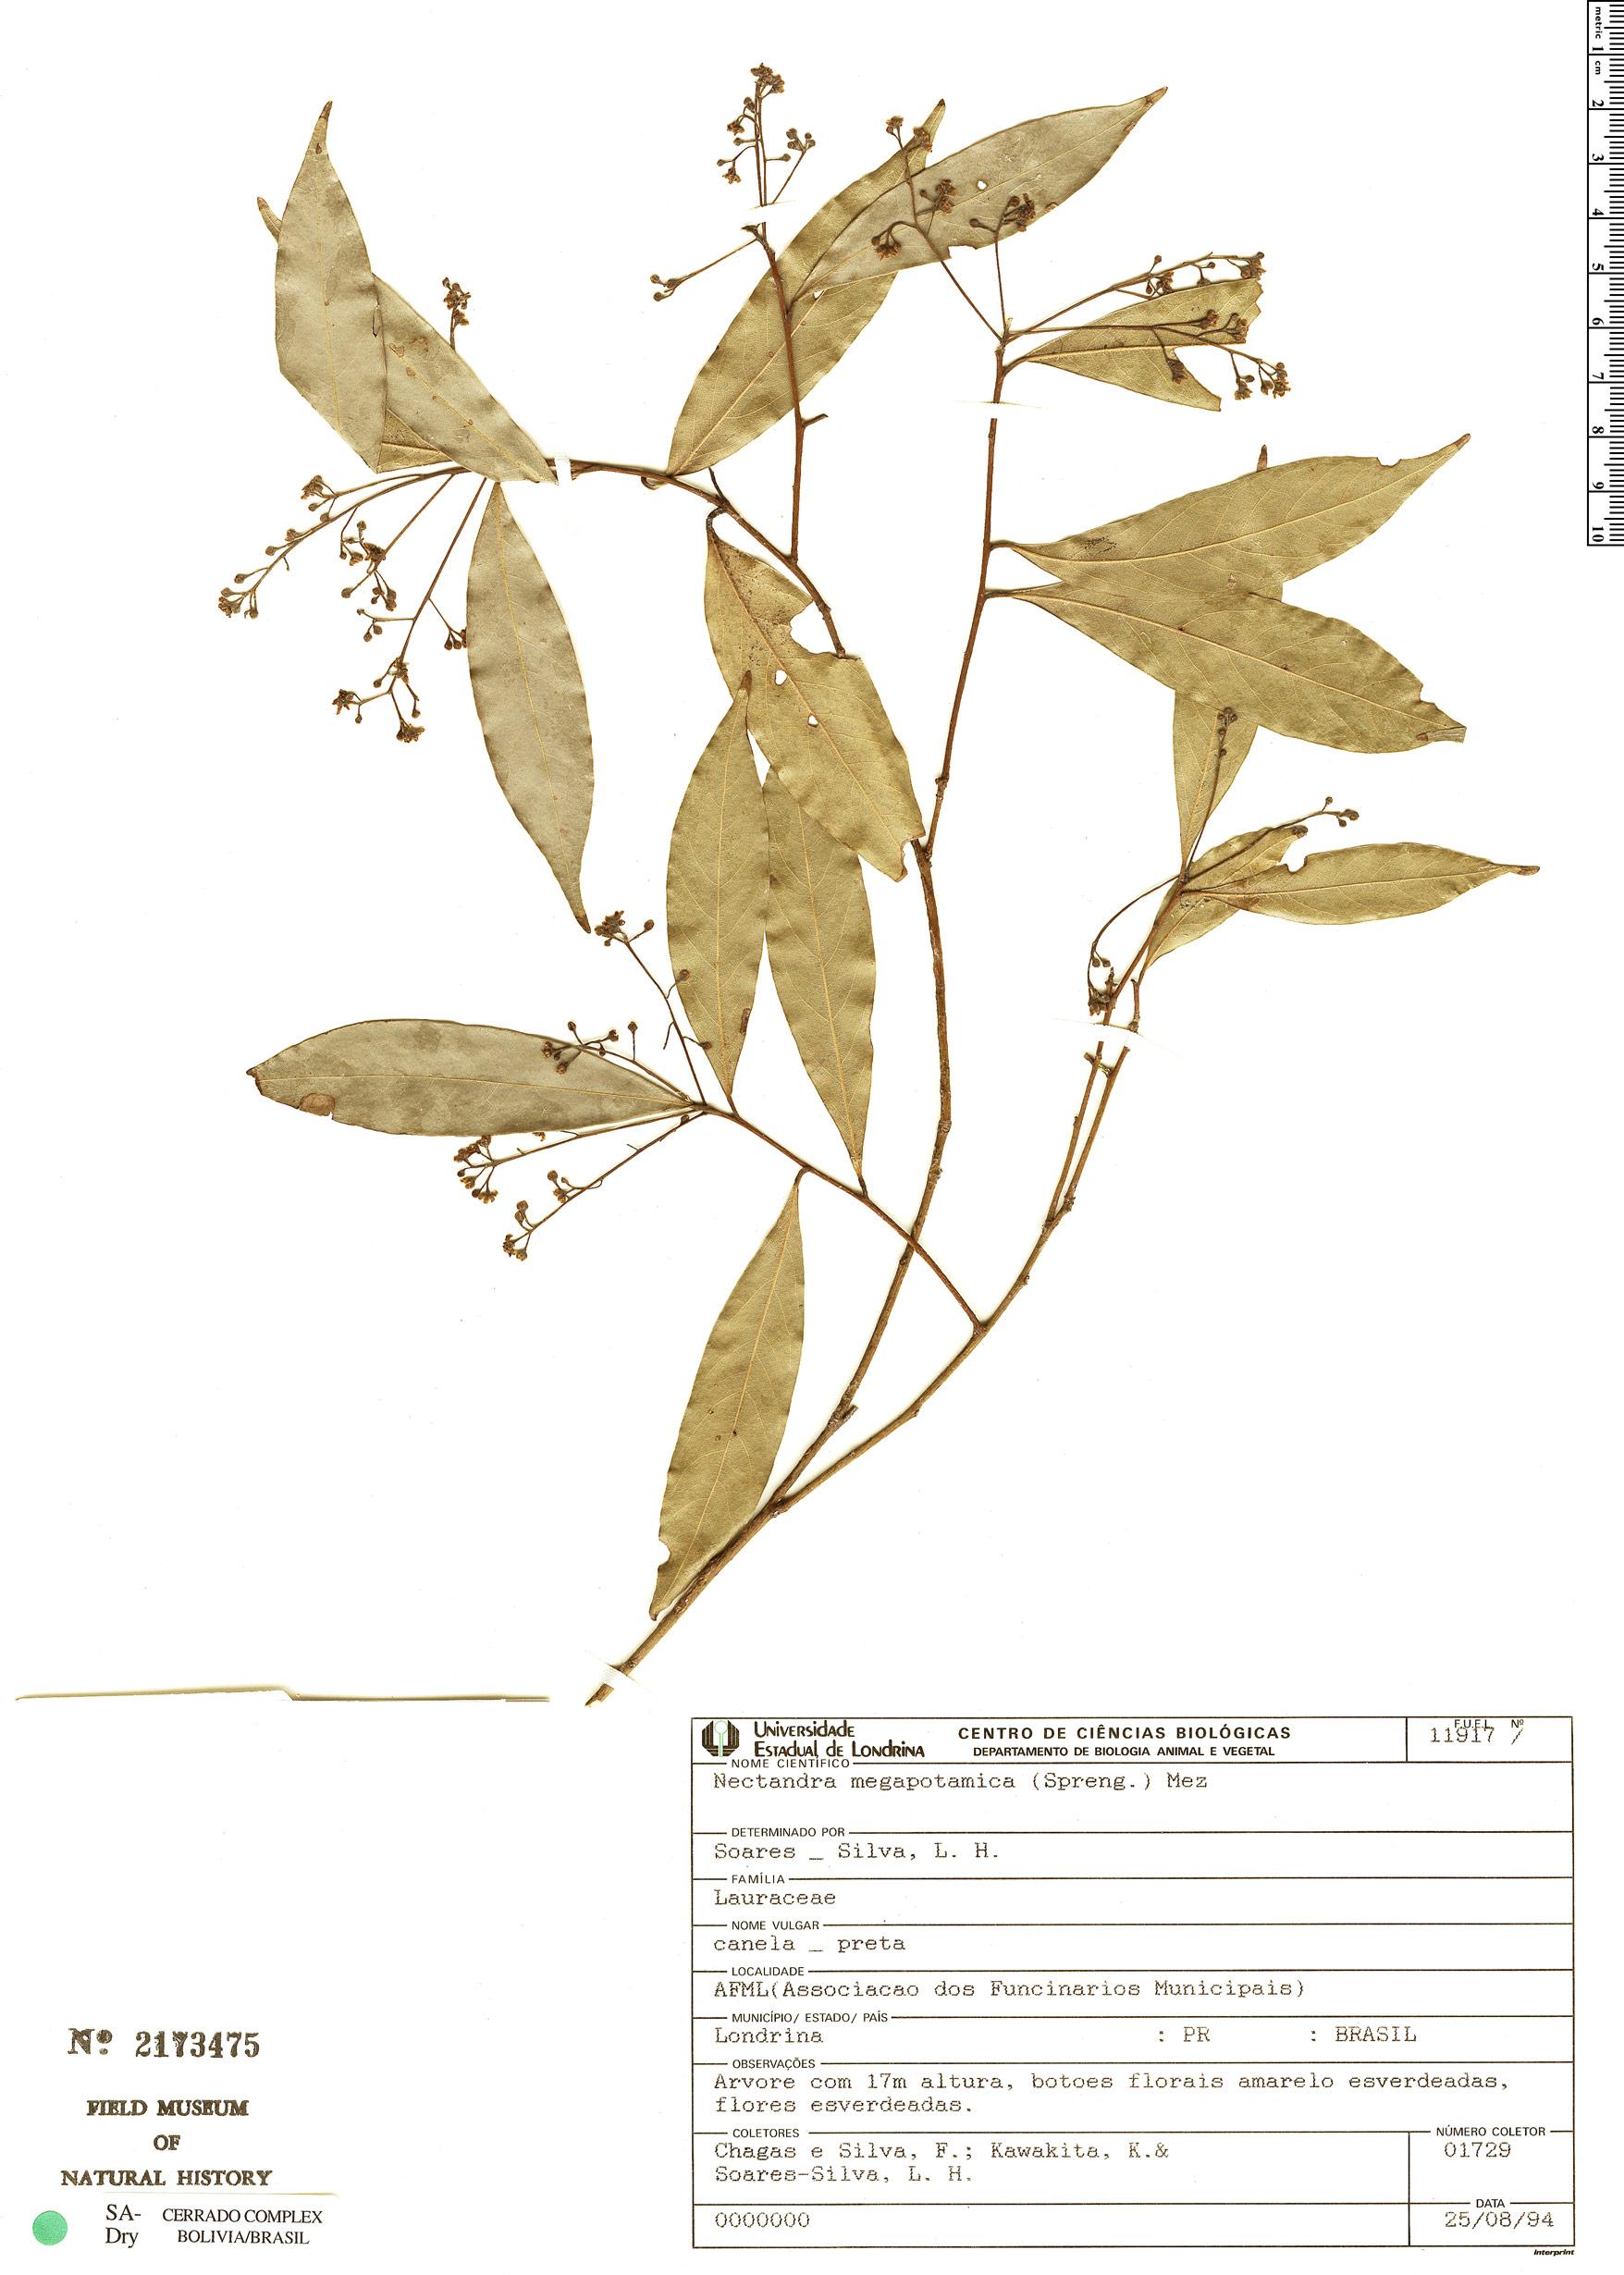 Specimen: Nectandra megapotamica